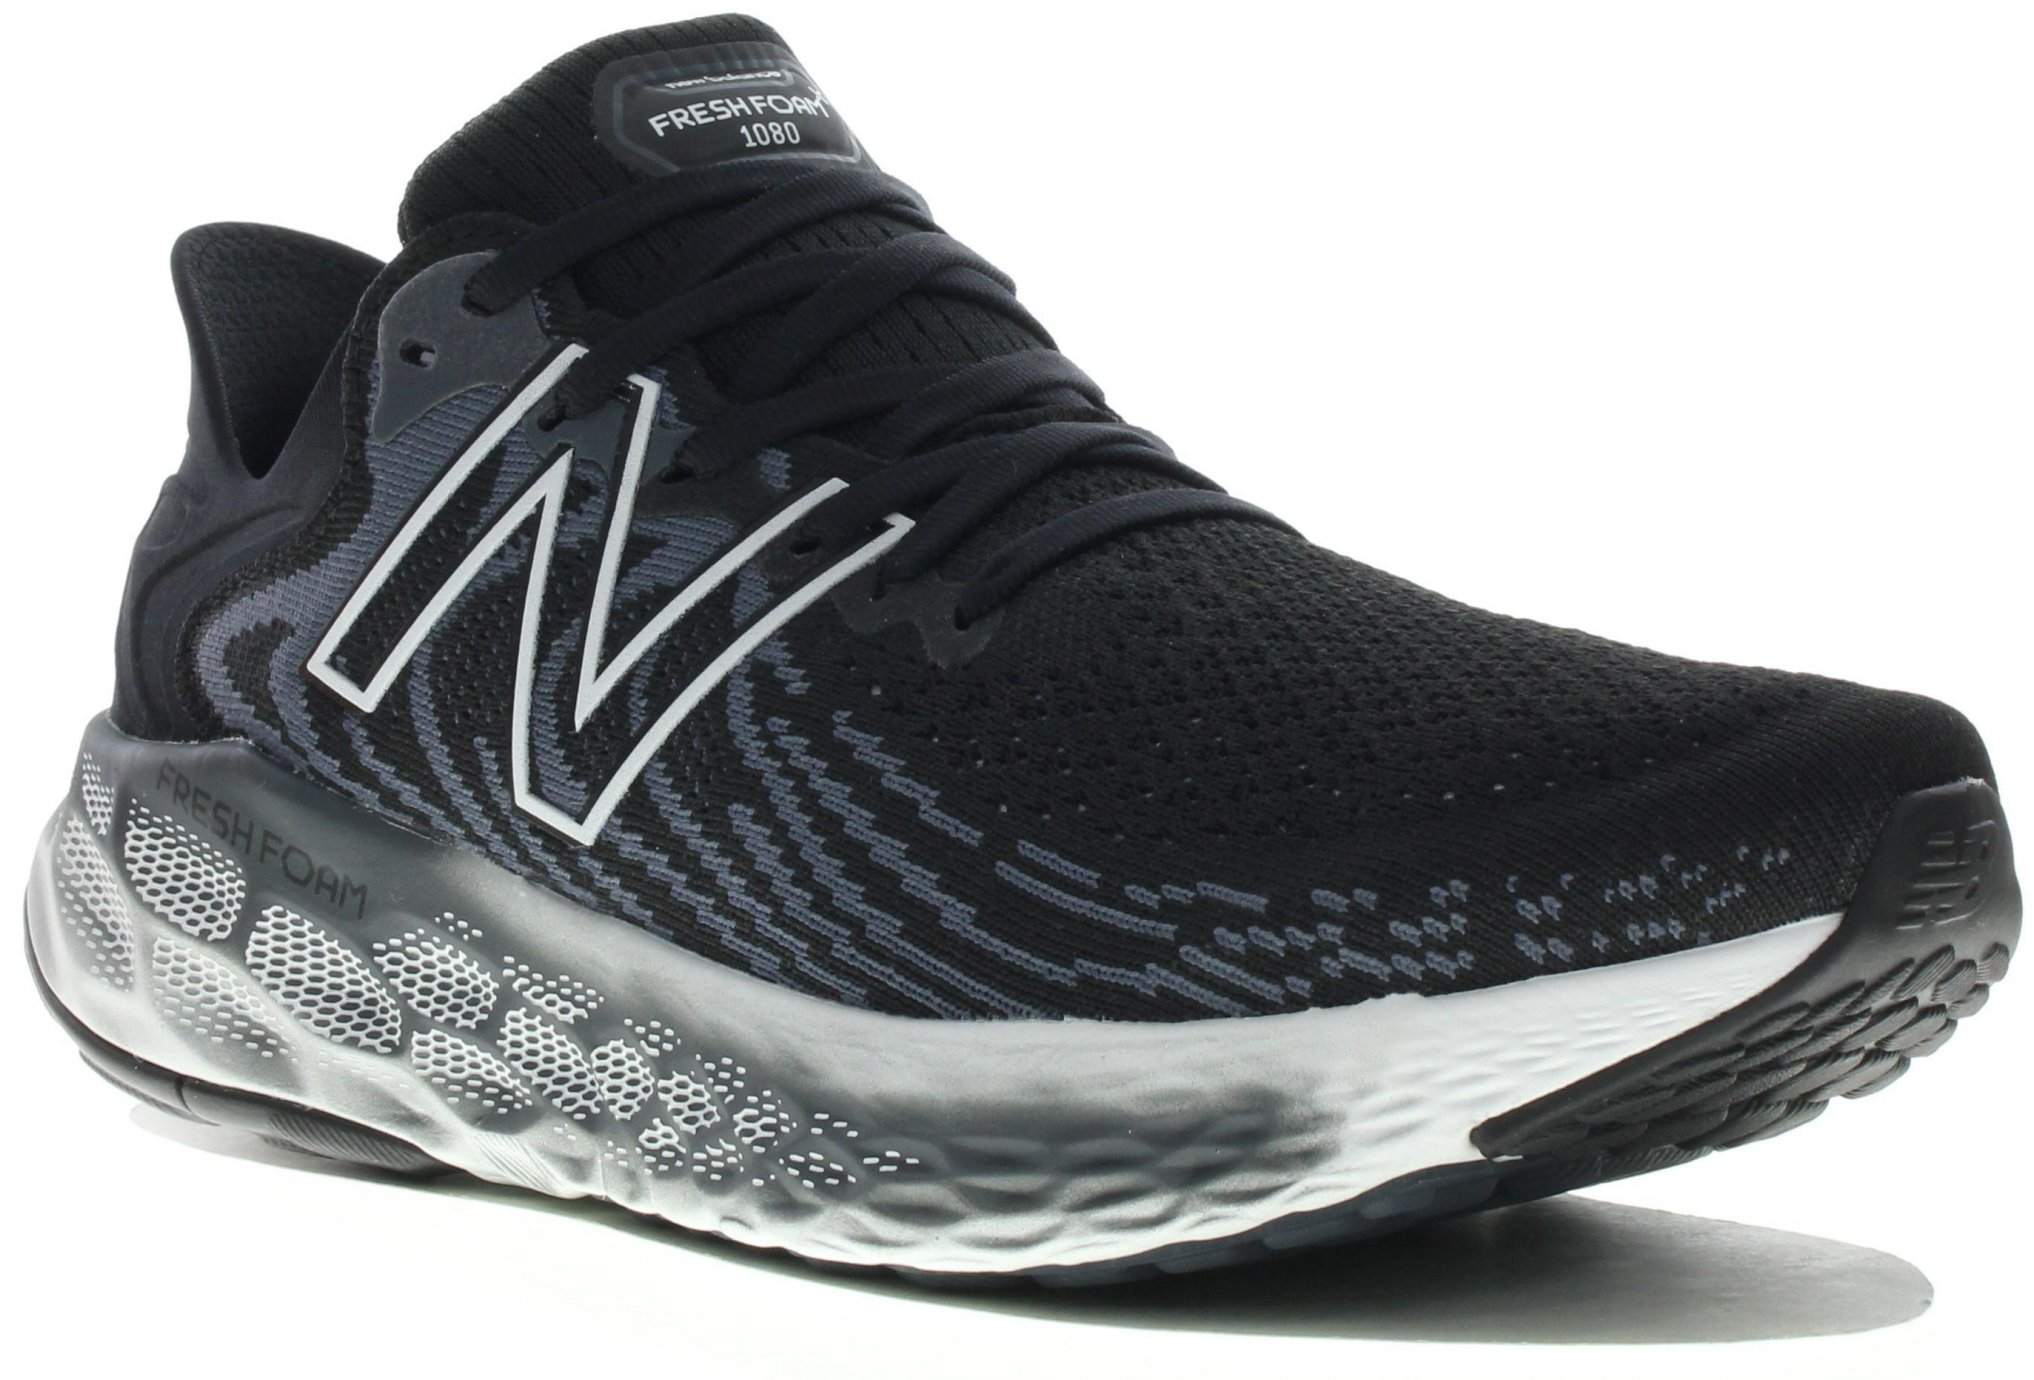 New Balance Fresh Foam M 1080 V11 Chaussures homme